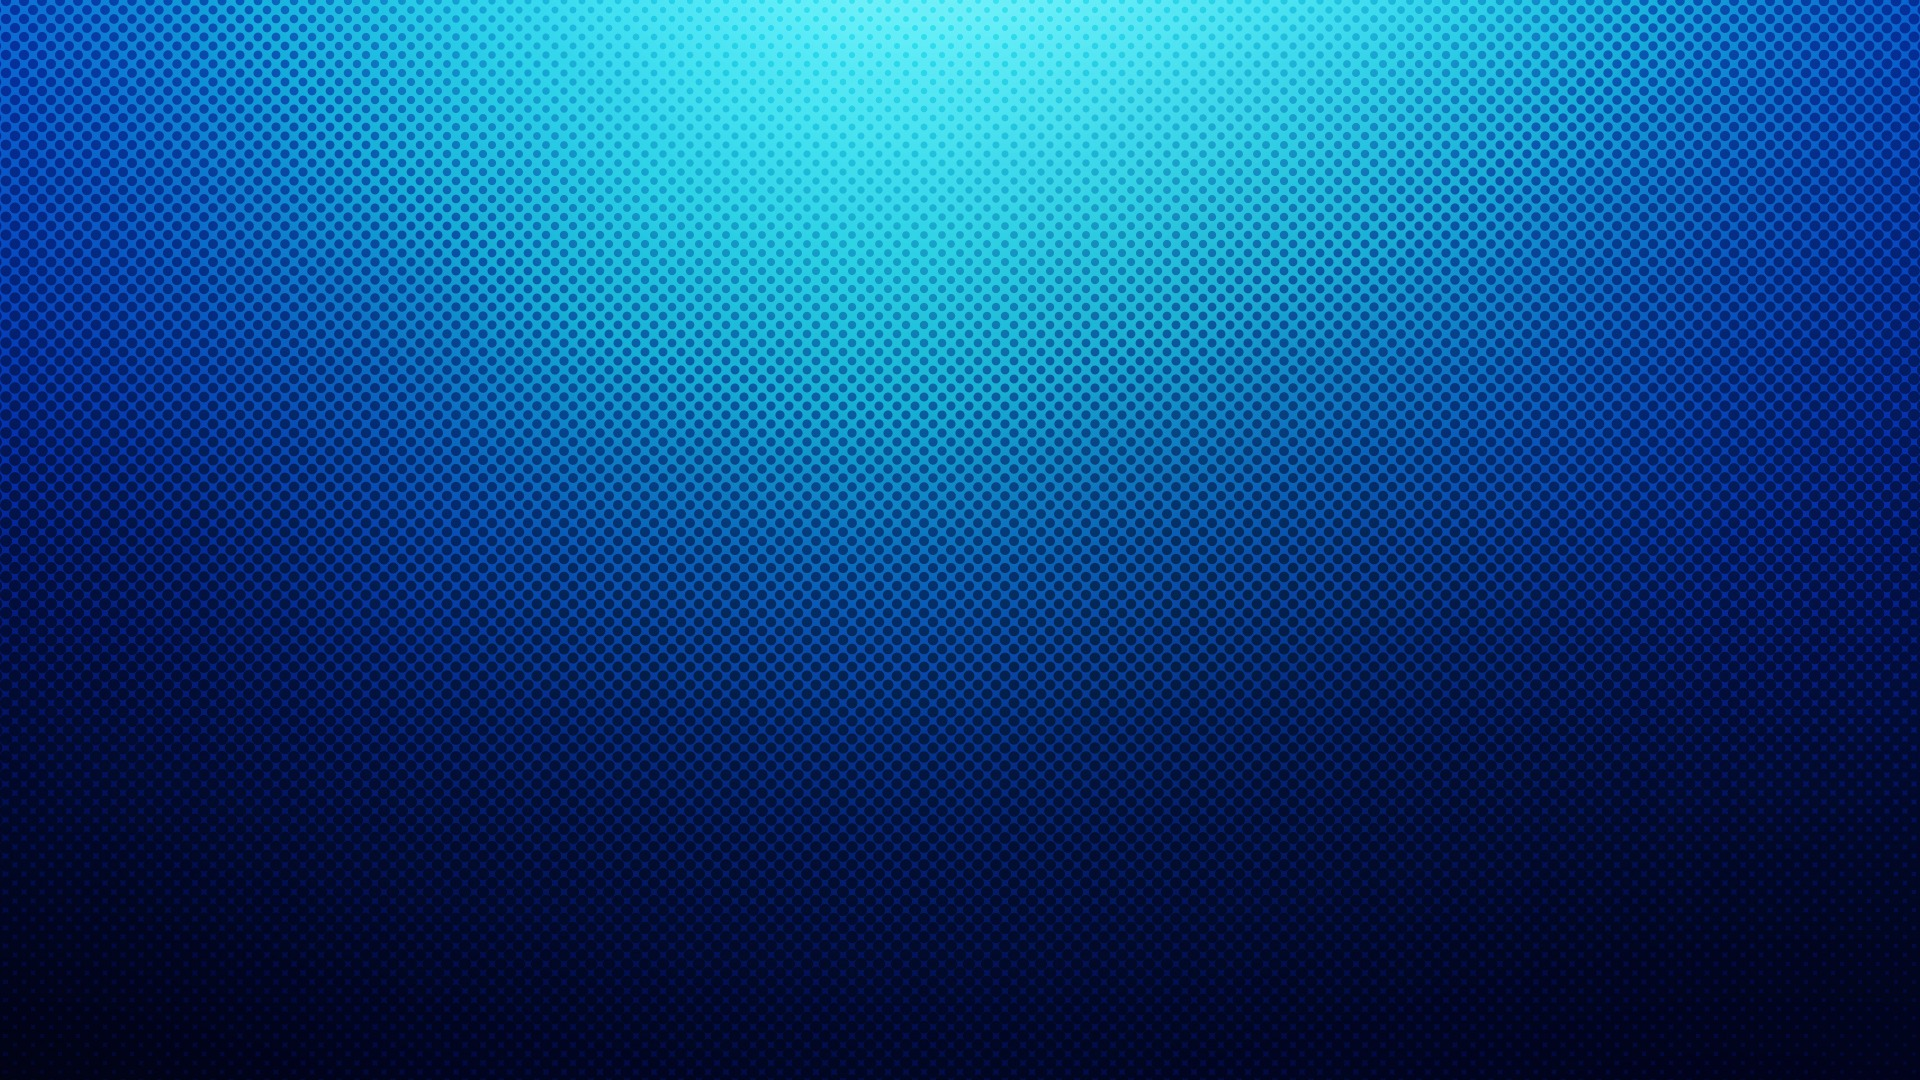 wallpapers of the week blue gradients with tasteful grunge 1920x1080